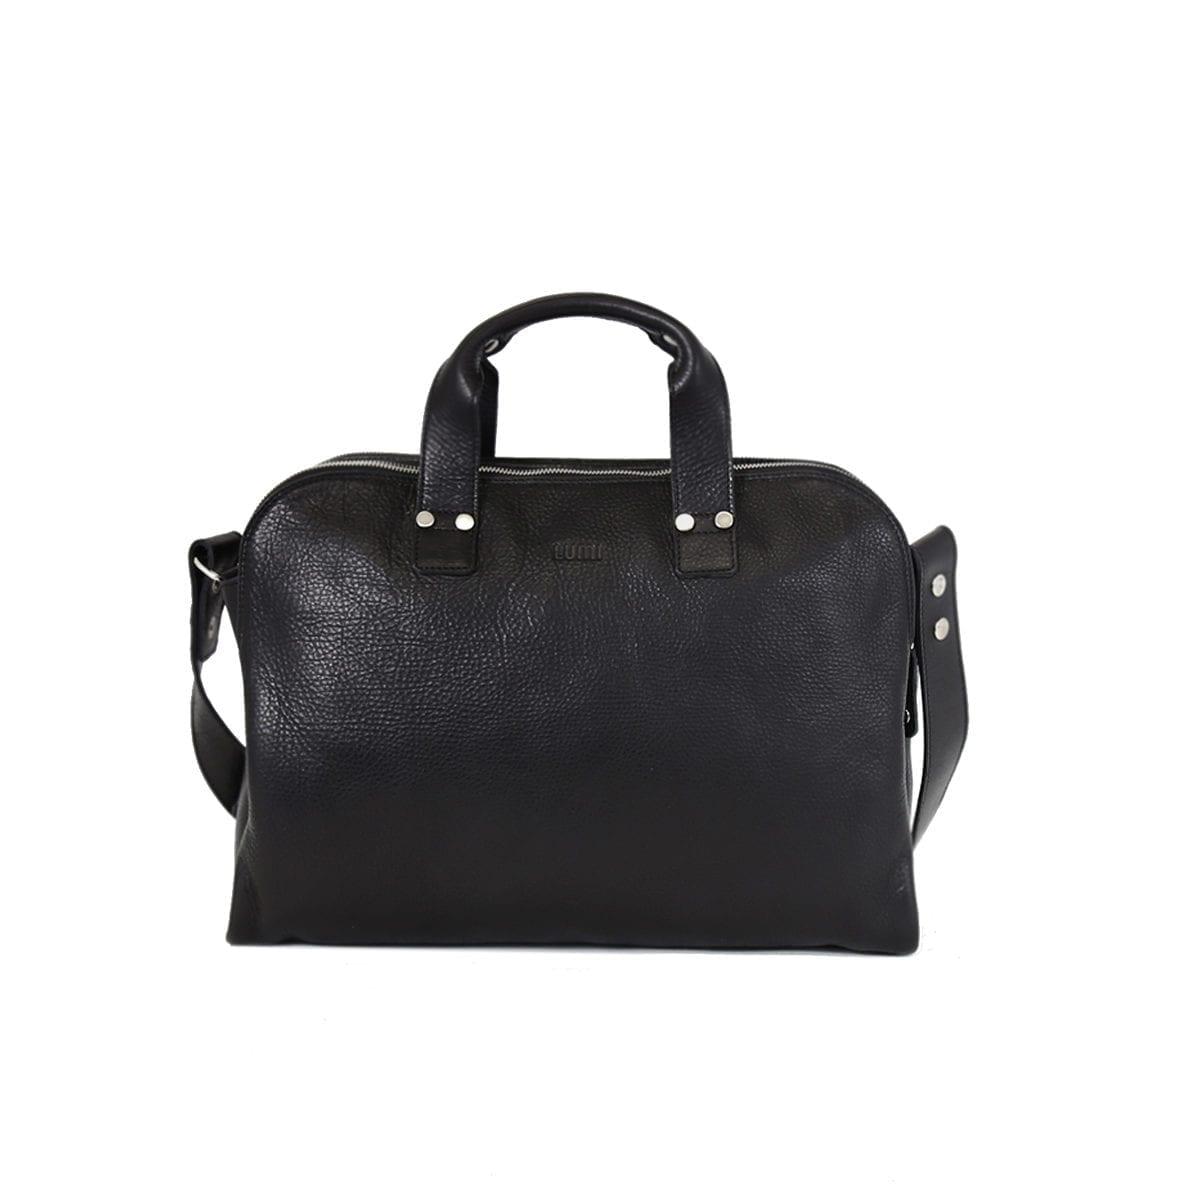 6204087940f7 Home Business Bags James James Business Bag Black